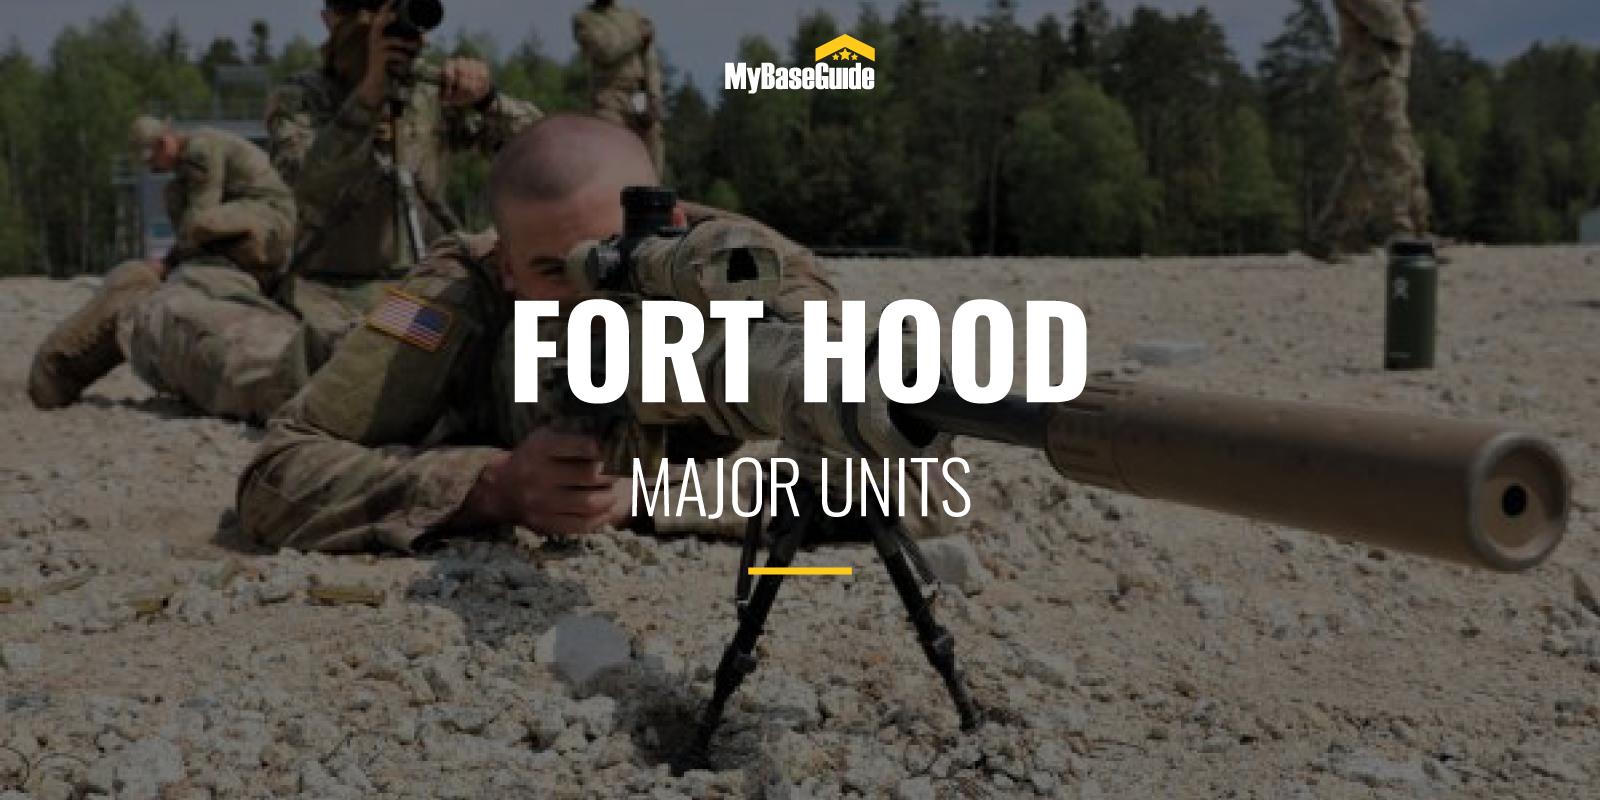 Fort Hood Major Units